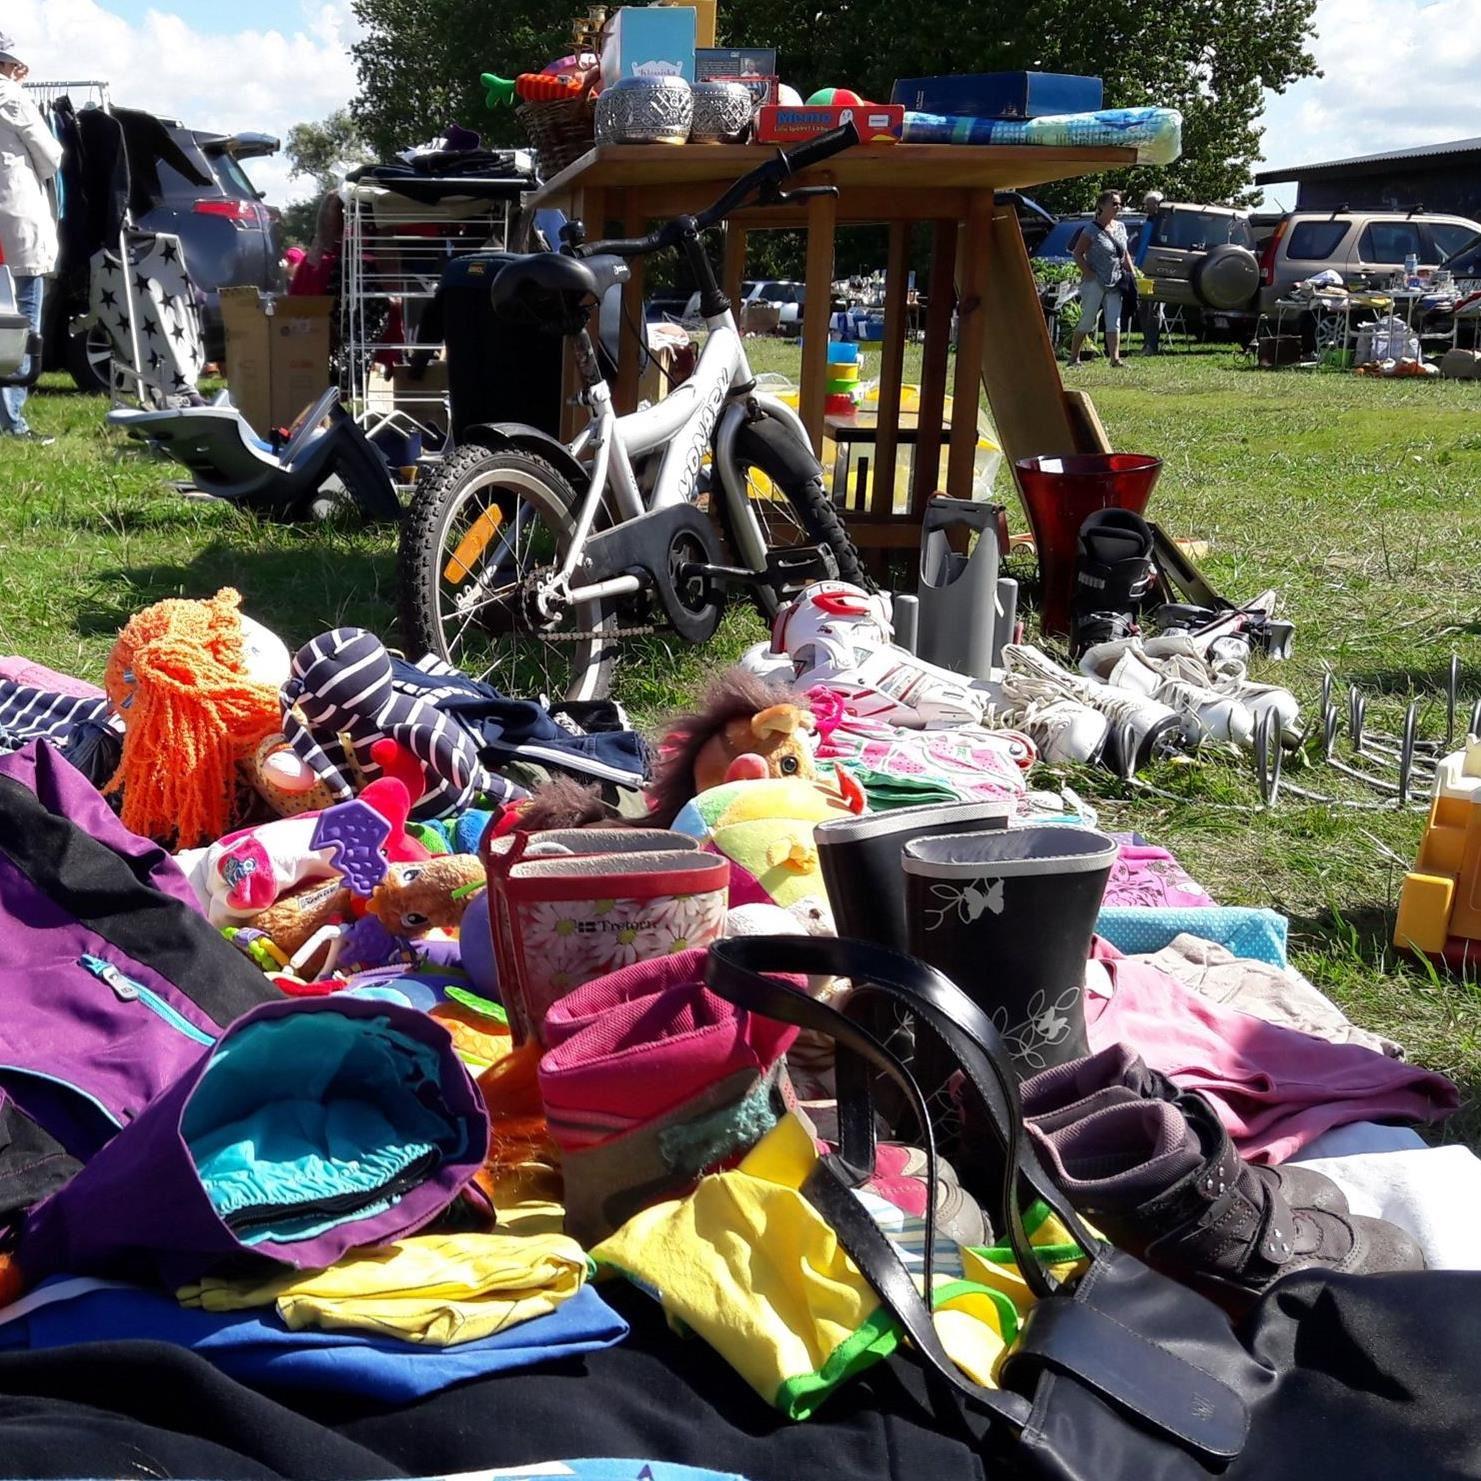 © VikingaTider, Car Boot Sale on Sundays